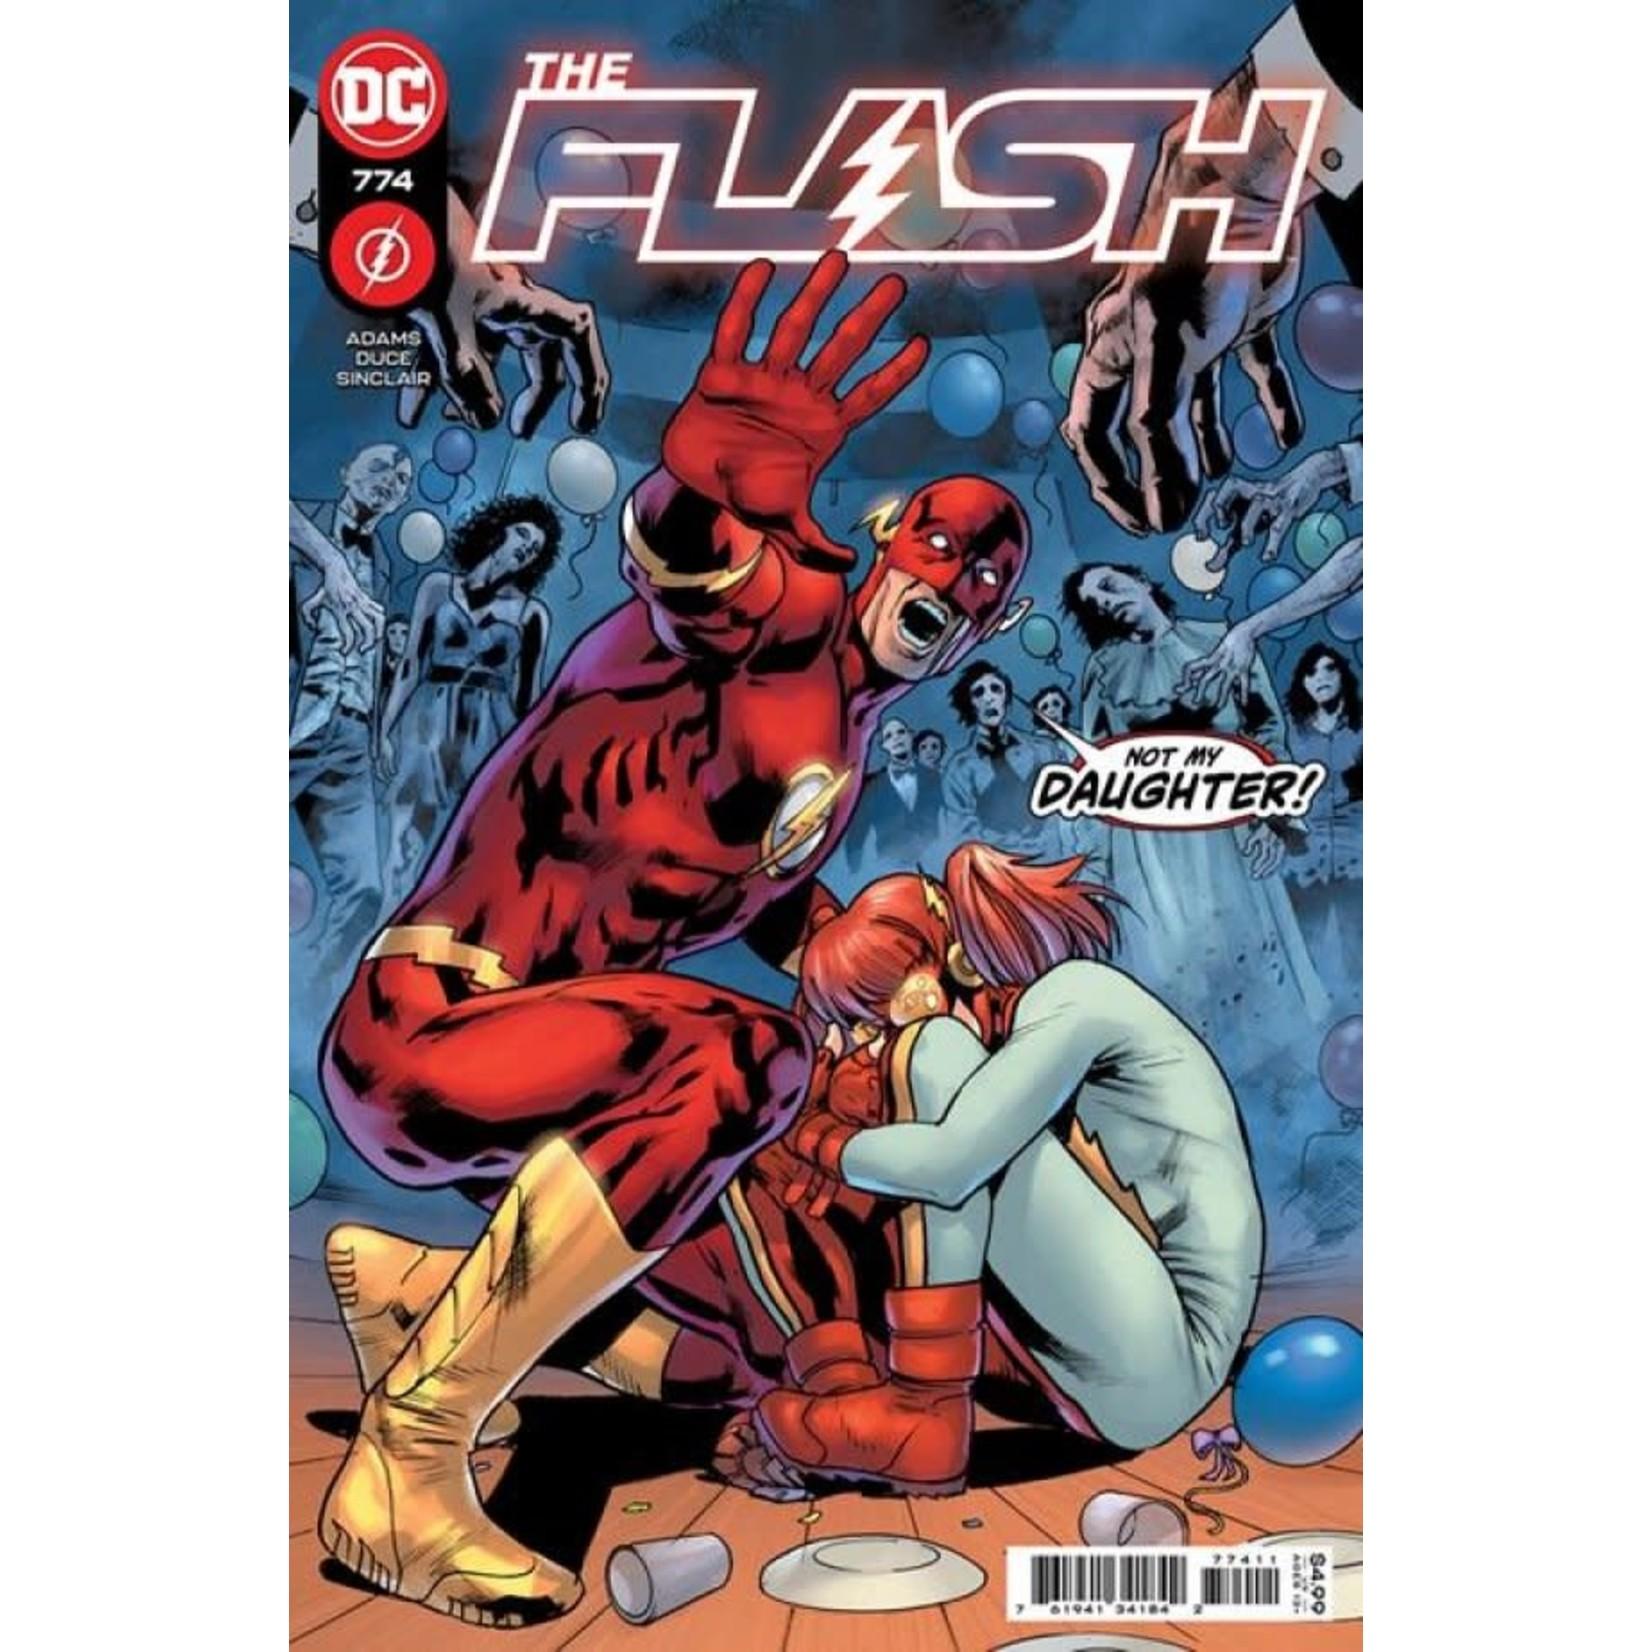 DC Comics The Flash #774